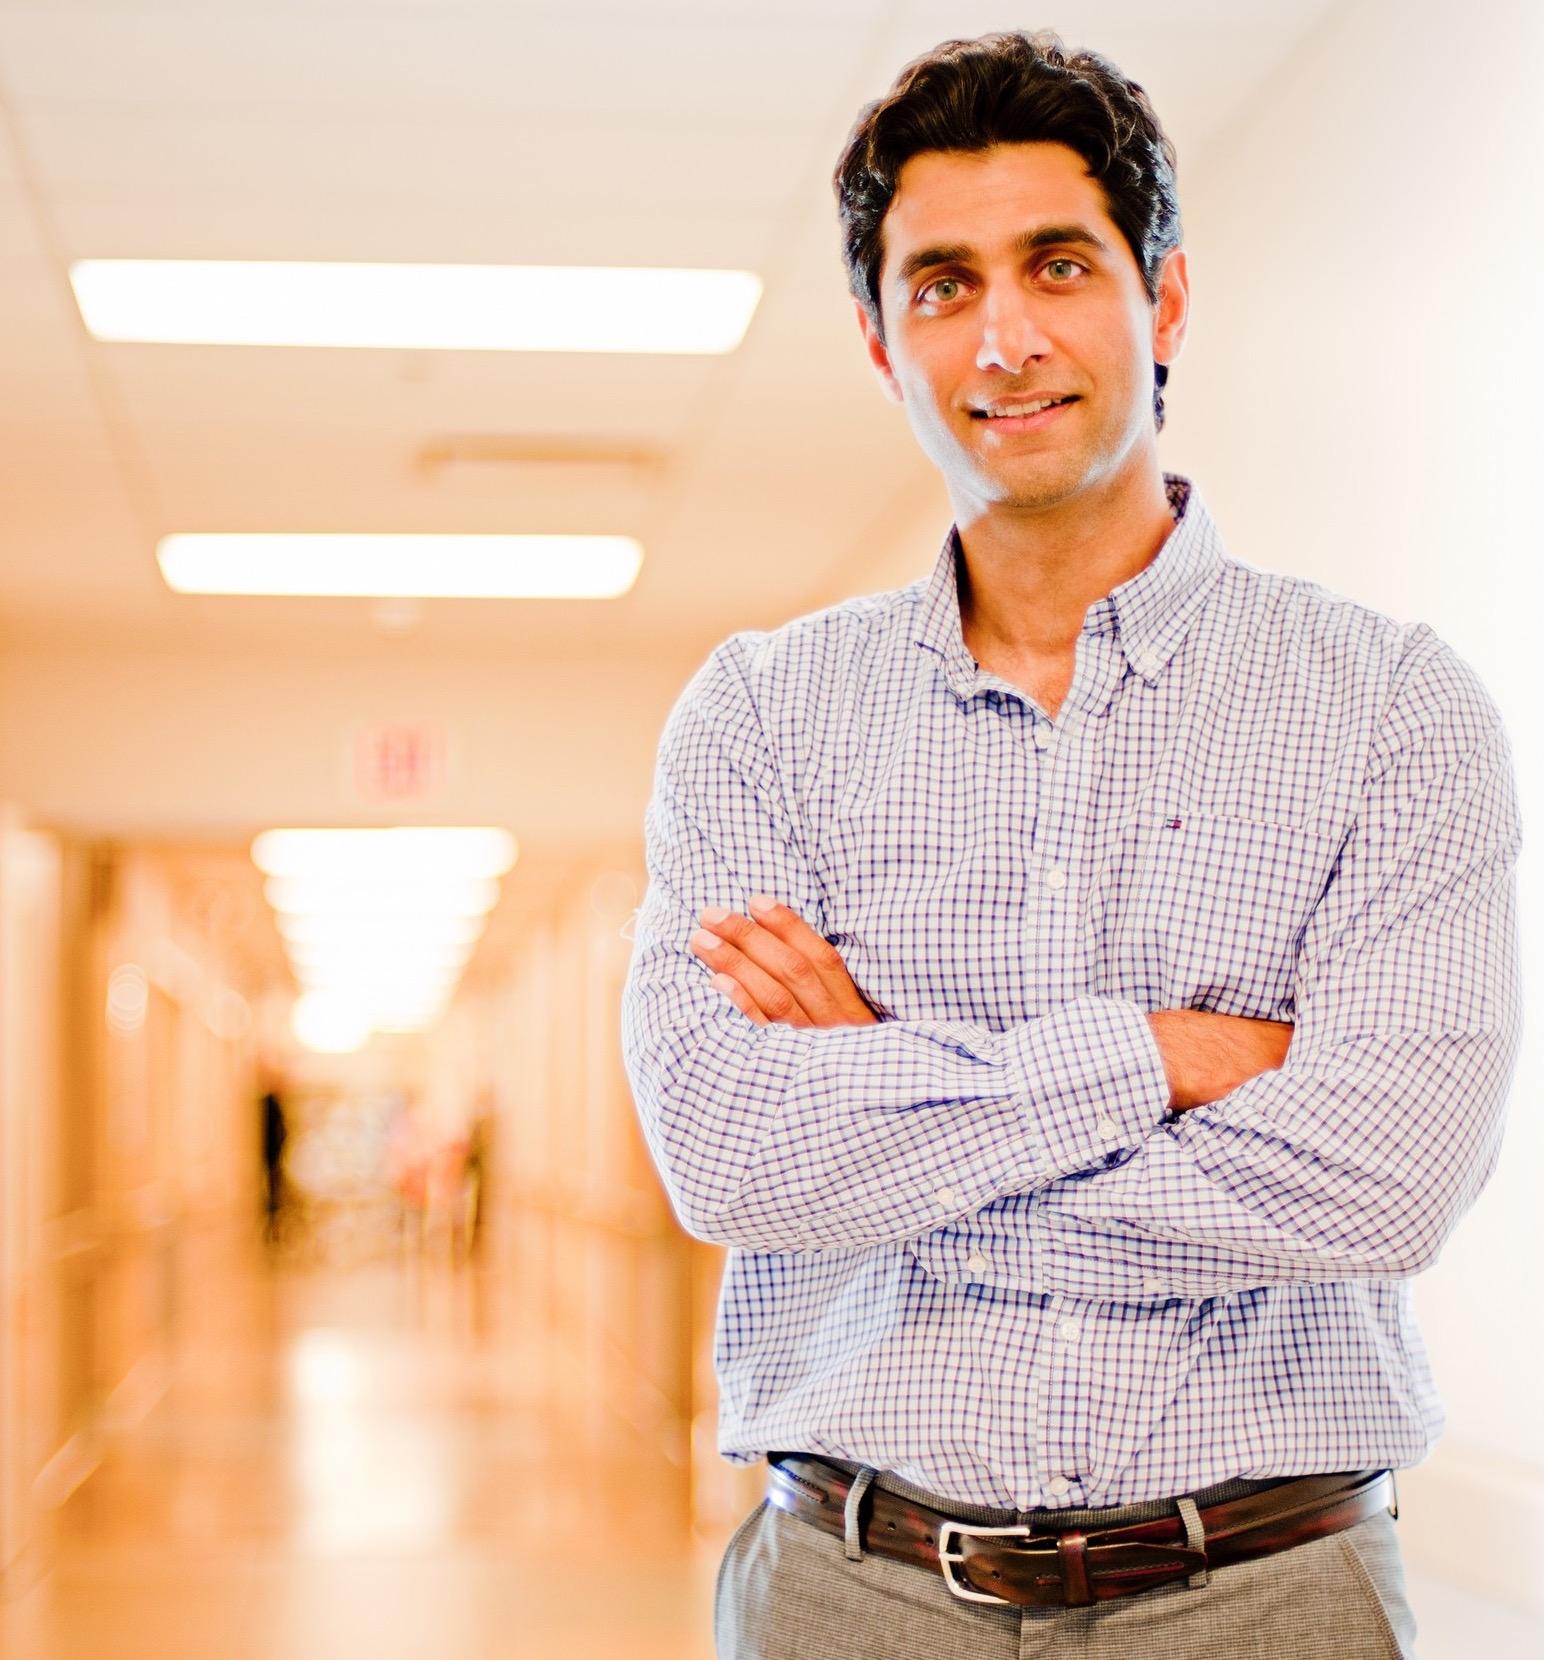 Dr. Kashif Irshad, MD, MSc, FRCSC